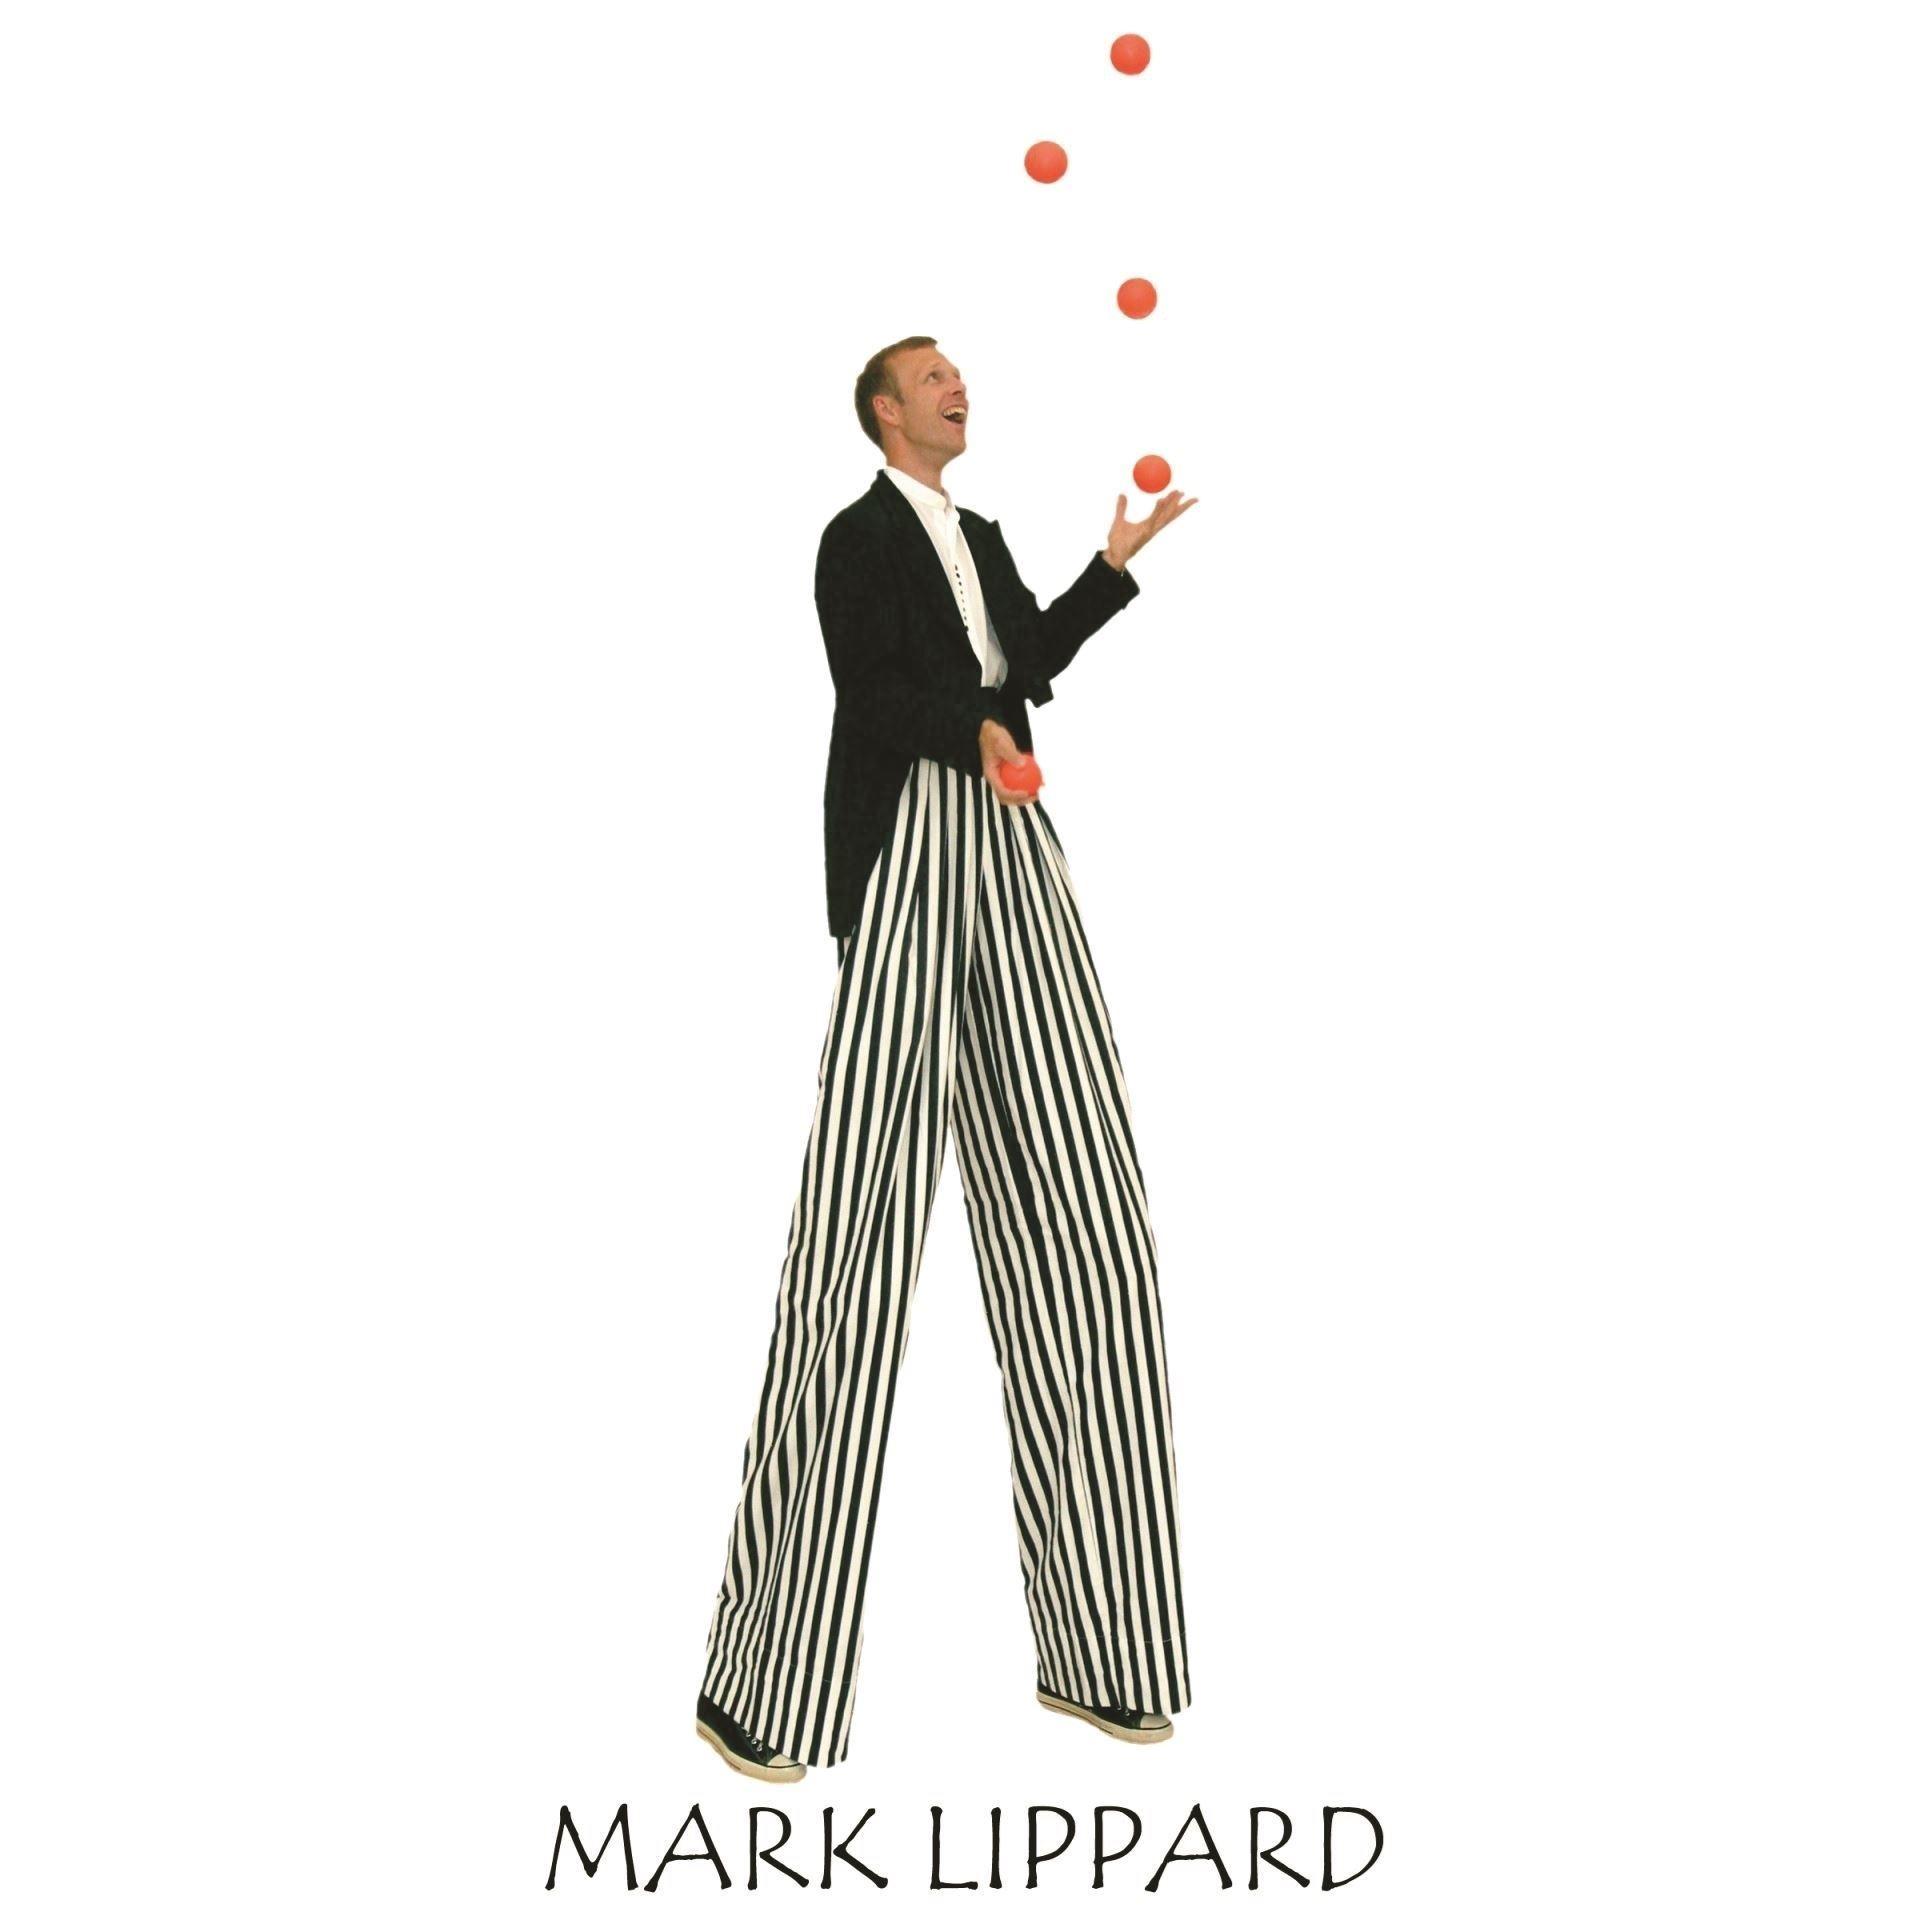 Mark Lippard